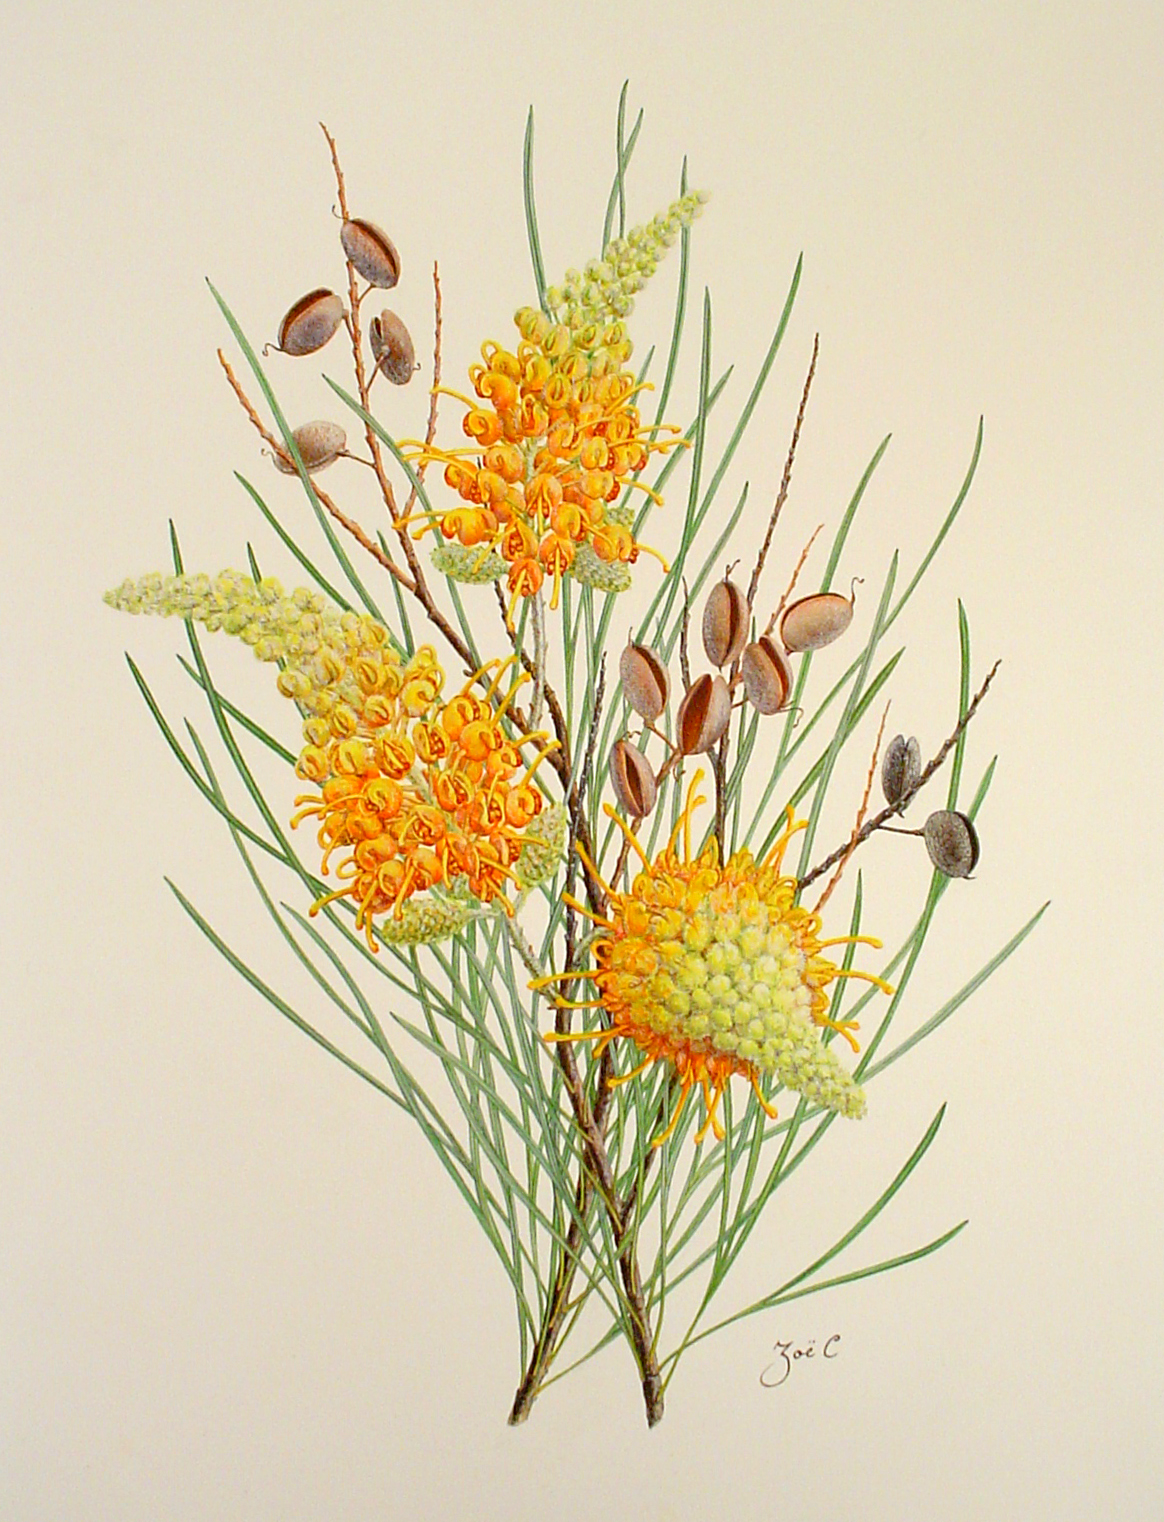 742-12910-grevillia-juncifolia-13-5x-17-5-2002